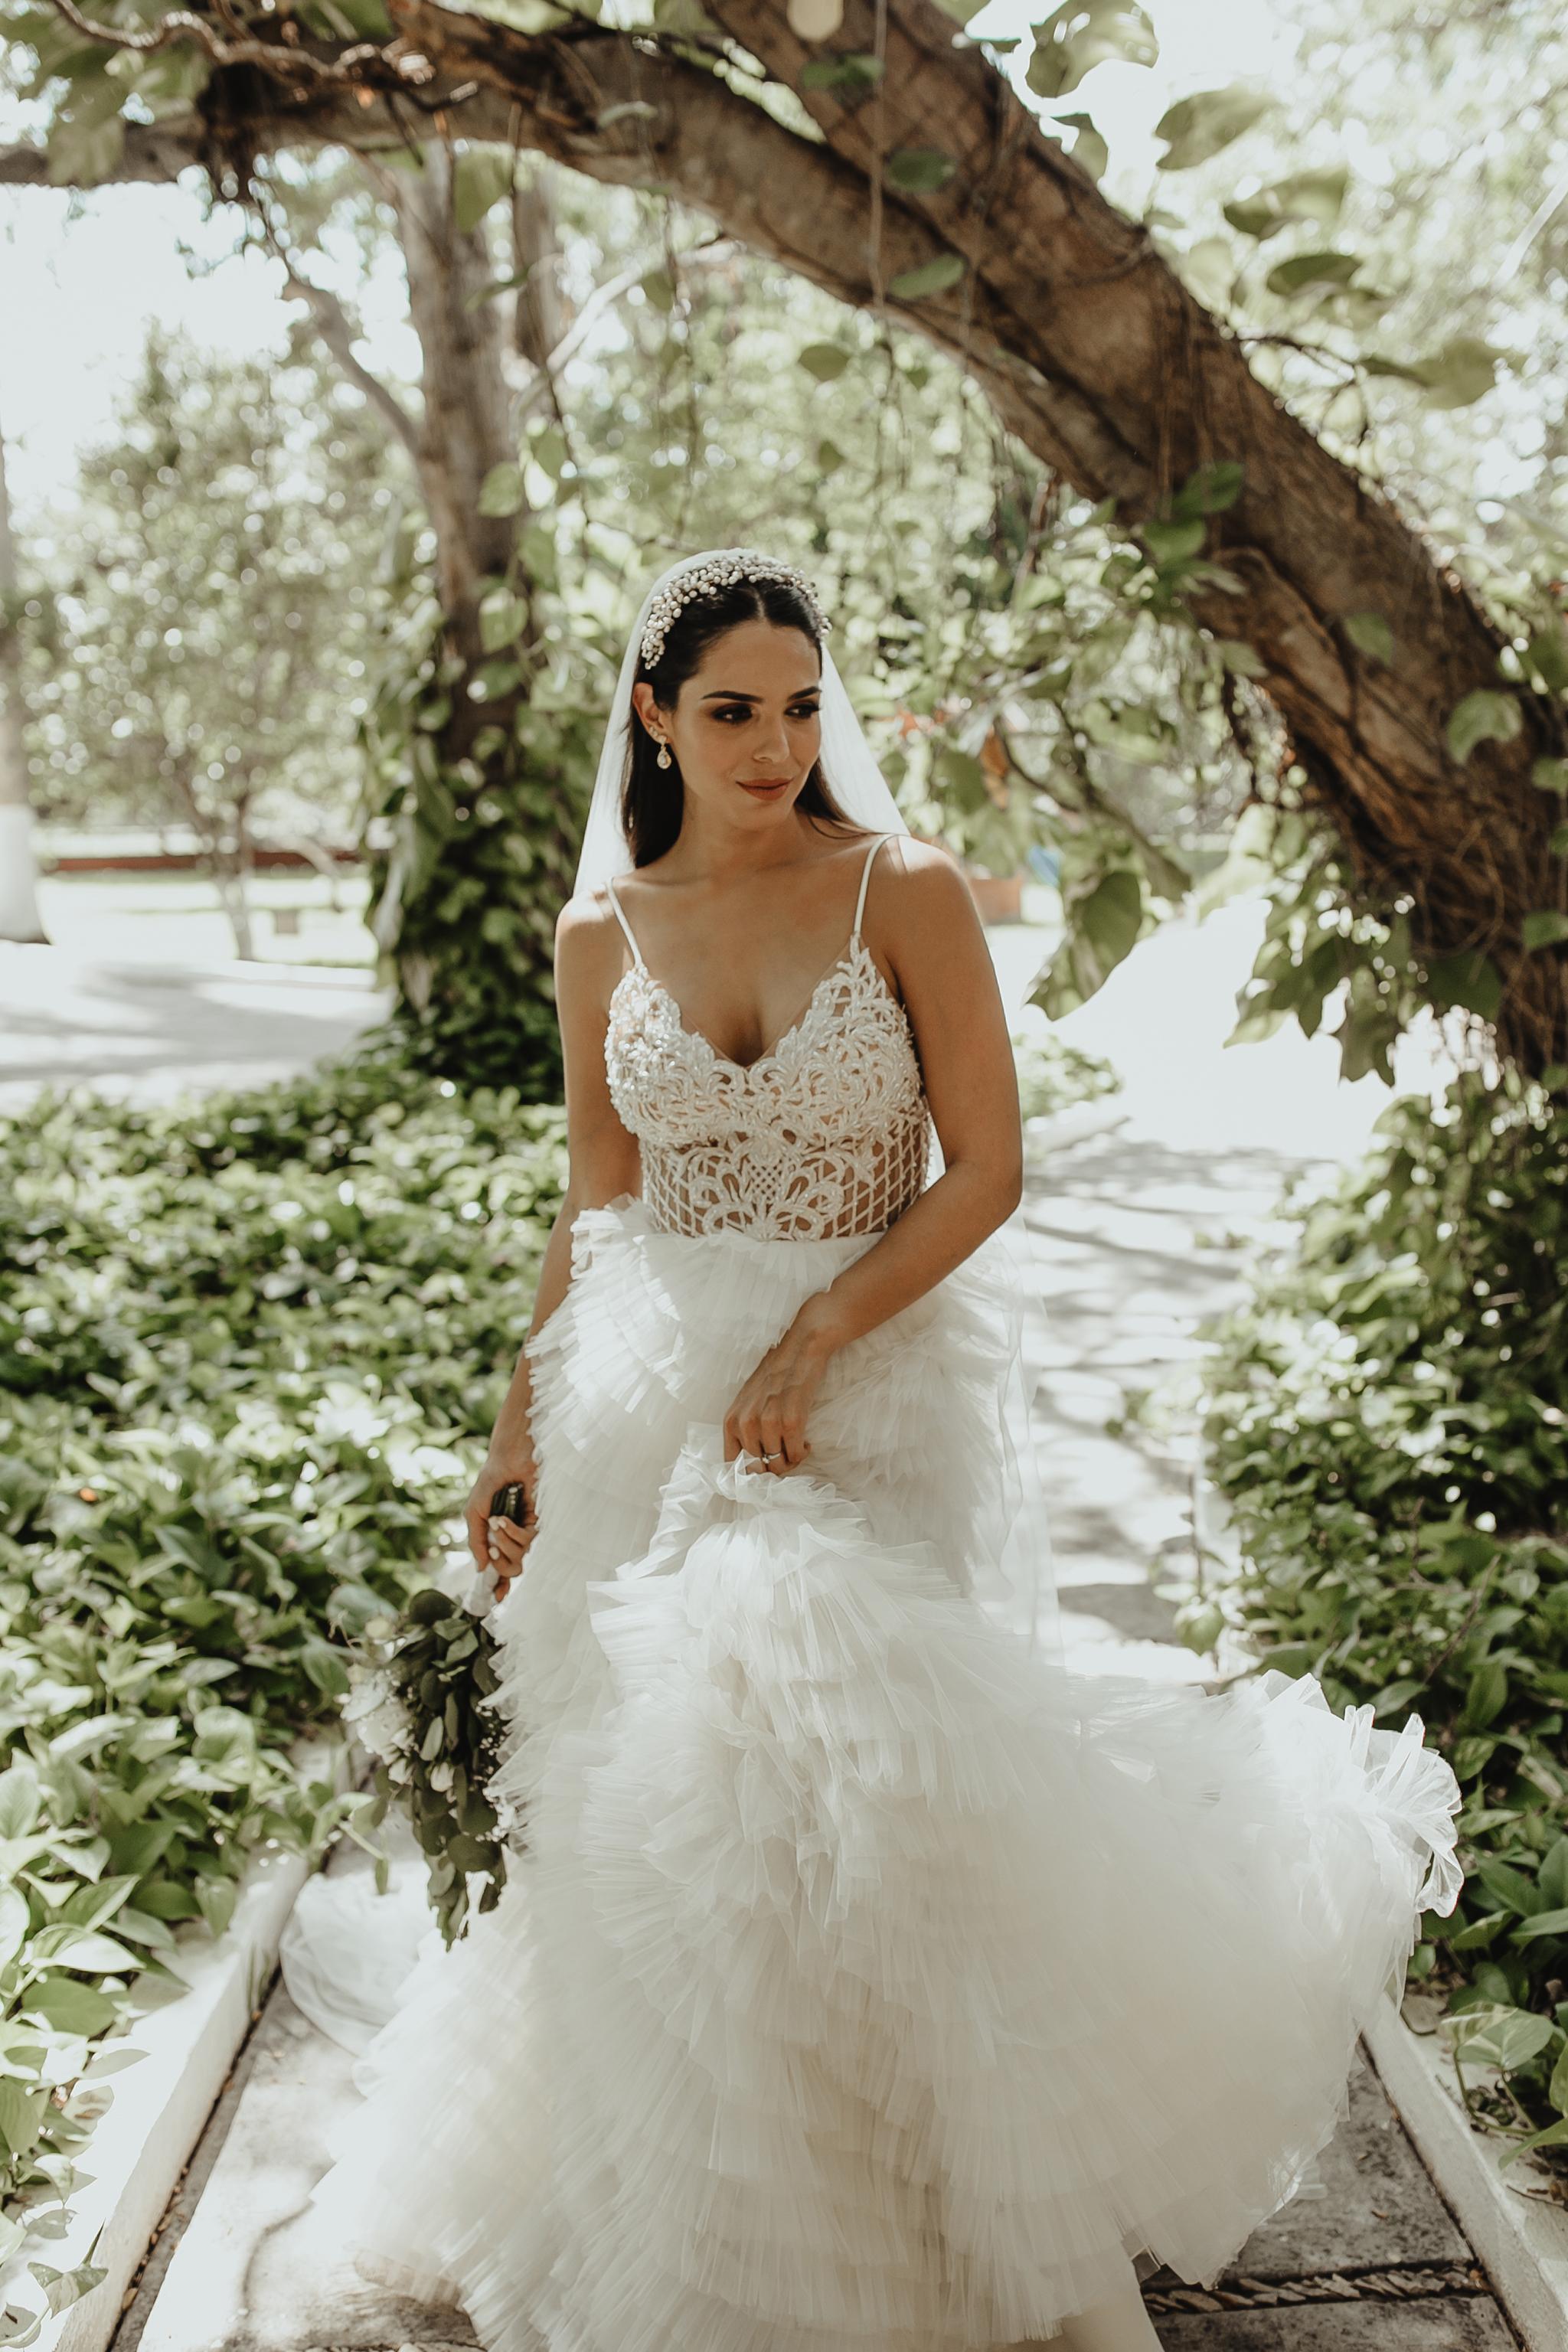 0349R&F__WeddingDestination_Weddingmerida_BodaMexico_FotografoDeBodas_FabrizioSimoneenFotografo.jpg